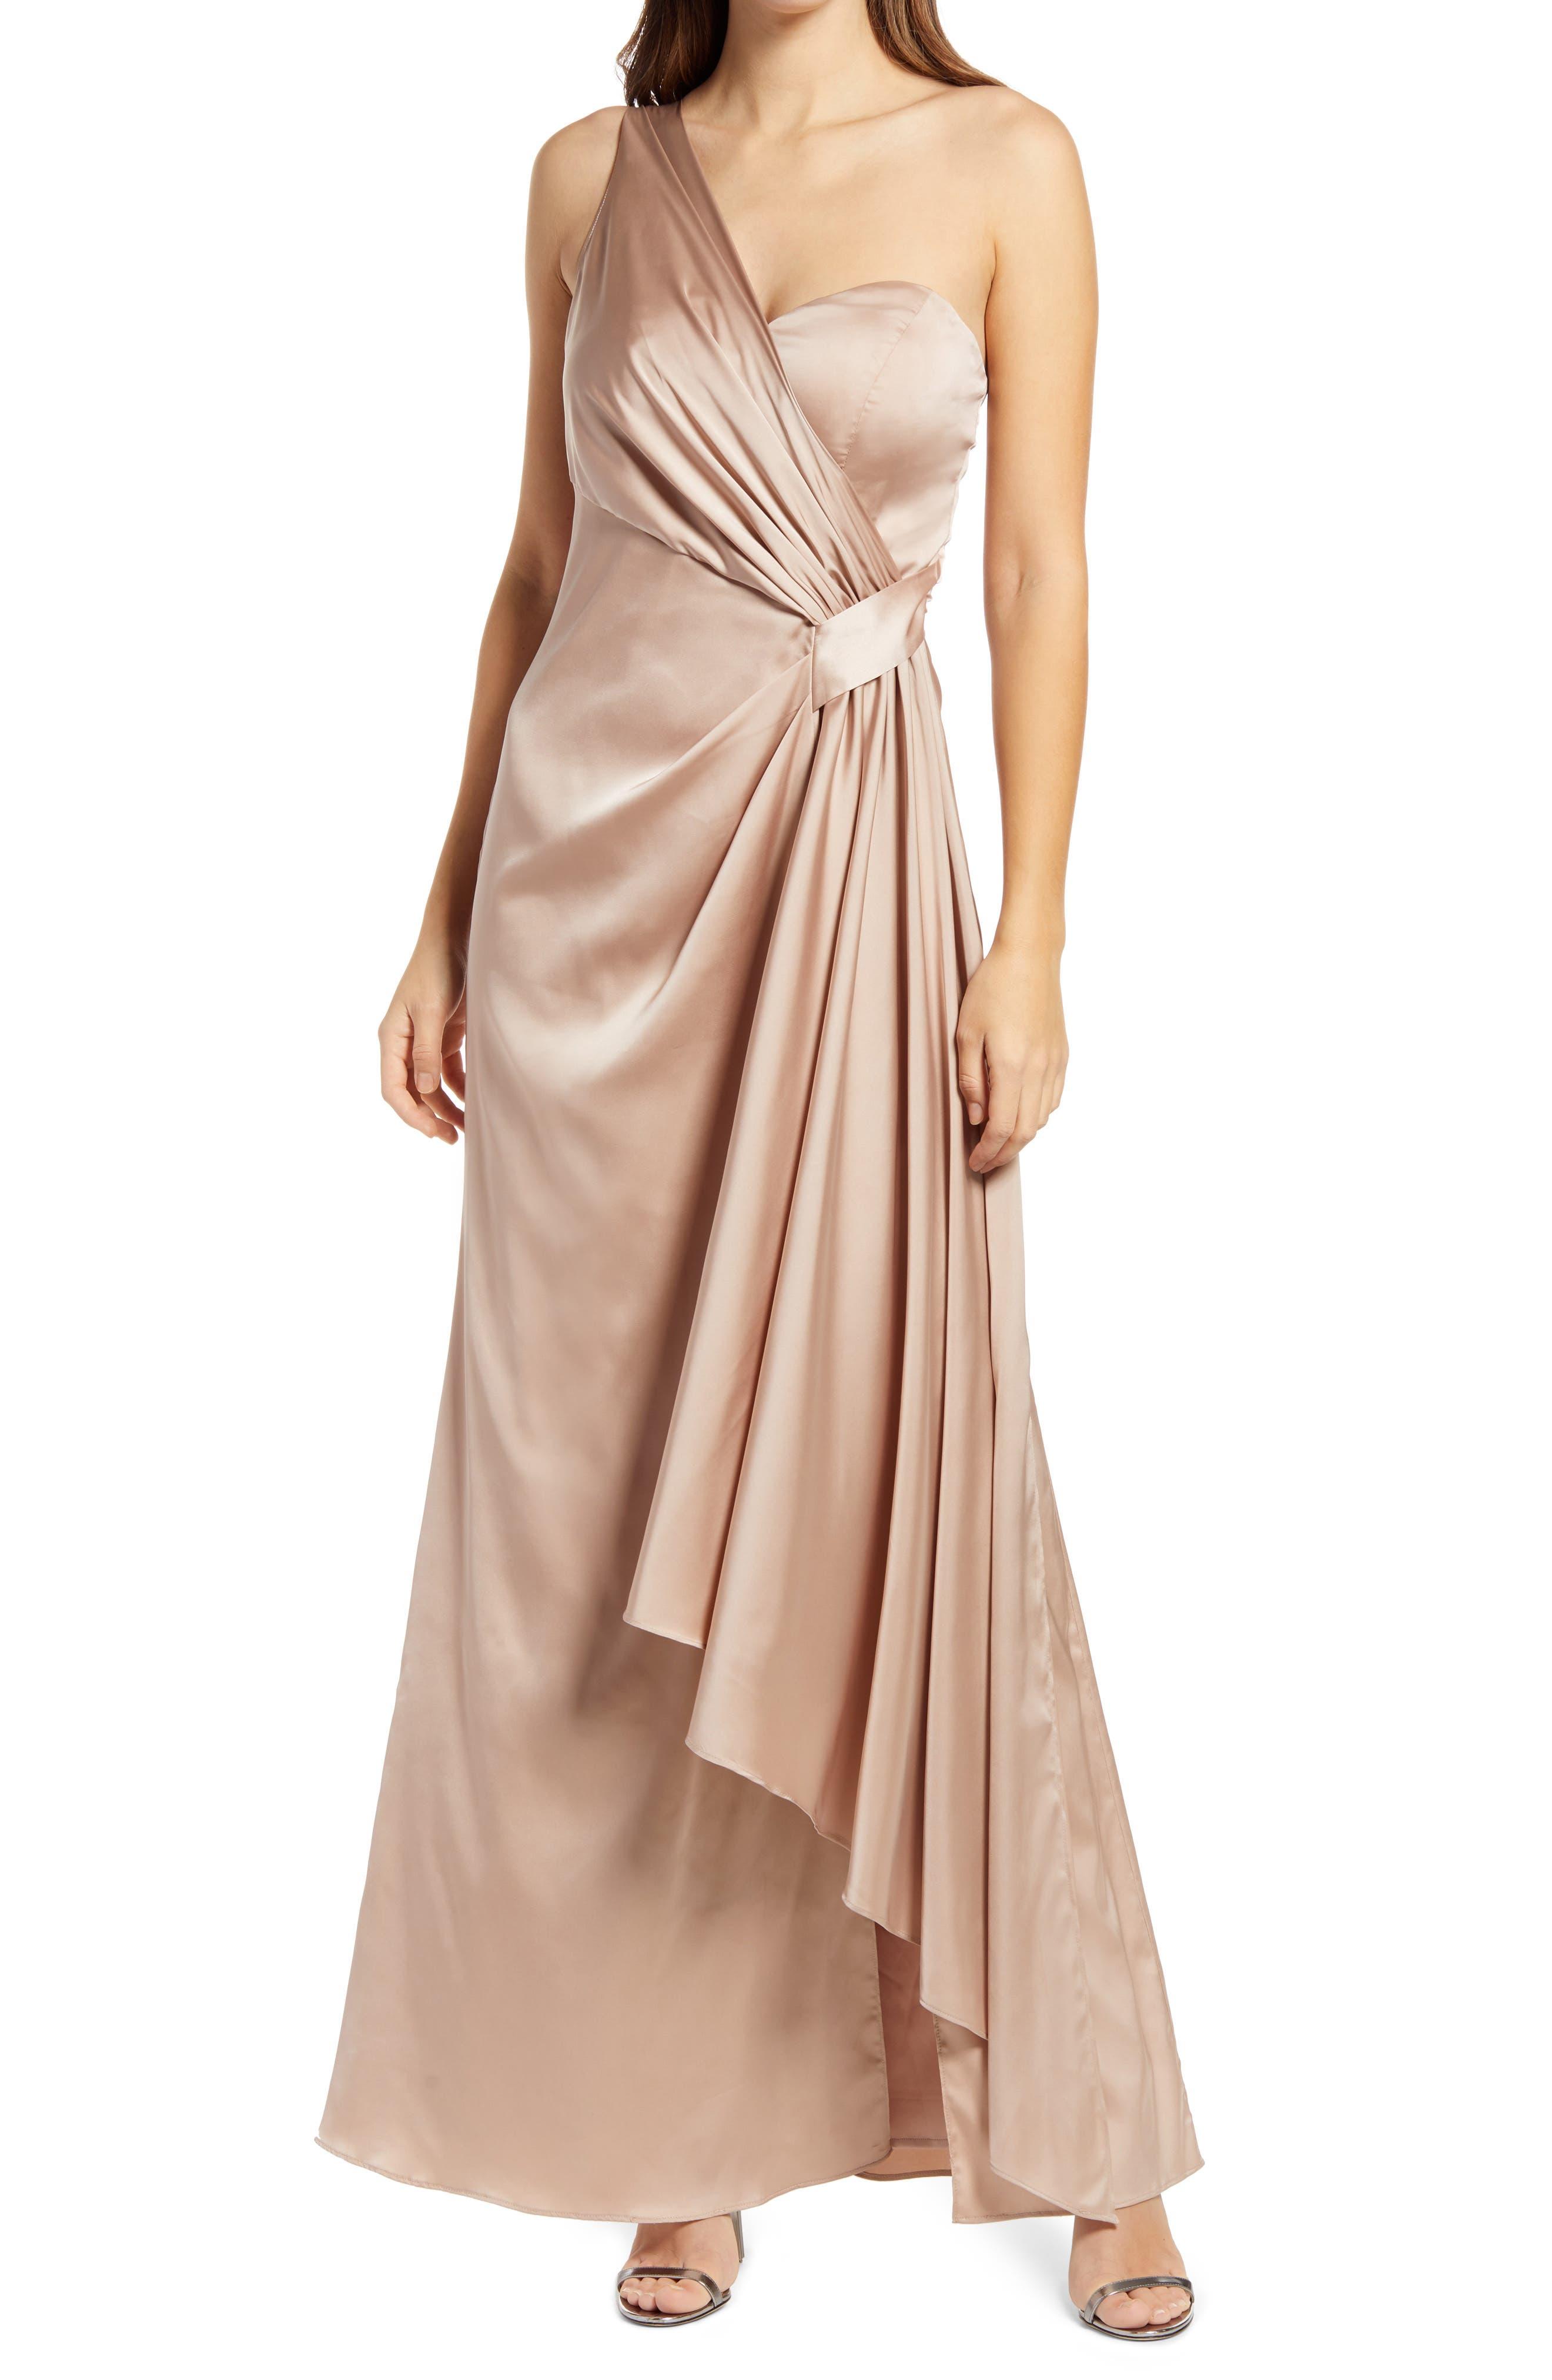 1930s Evening Dresses | Old Hollywood Silver Screen Dresses Womens Chi Chi London Draped One-Shoulder Bridesmaid Dress Size 10 - Beige $140.00 AT vintagedancer.com